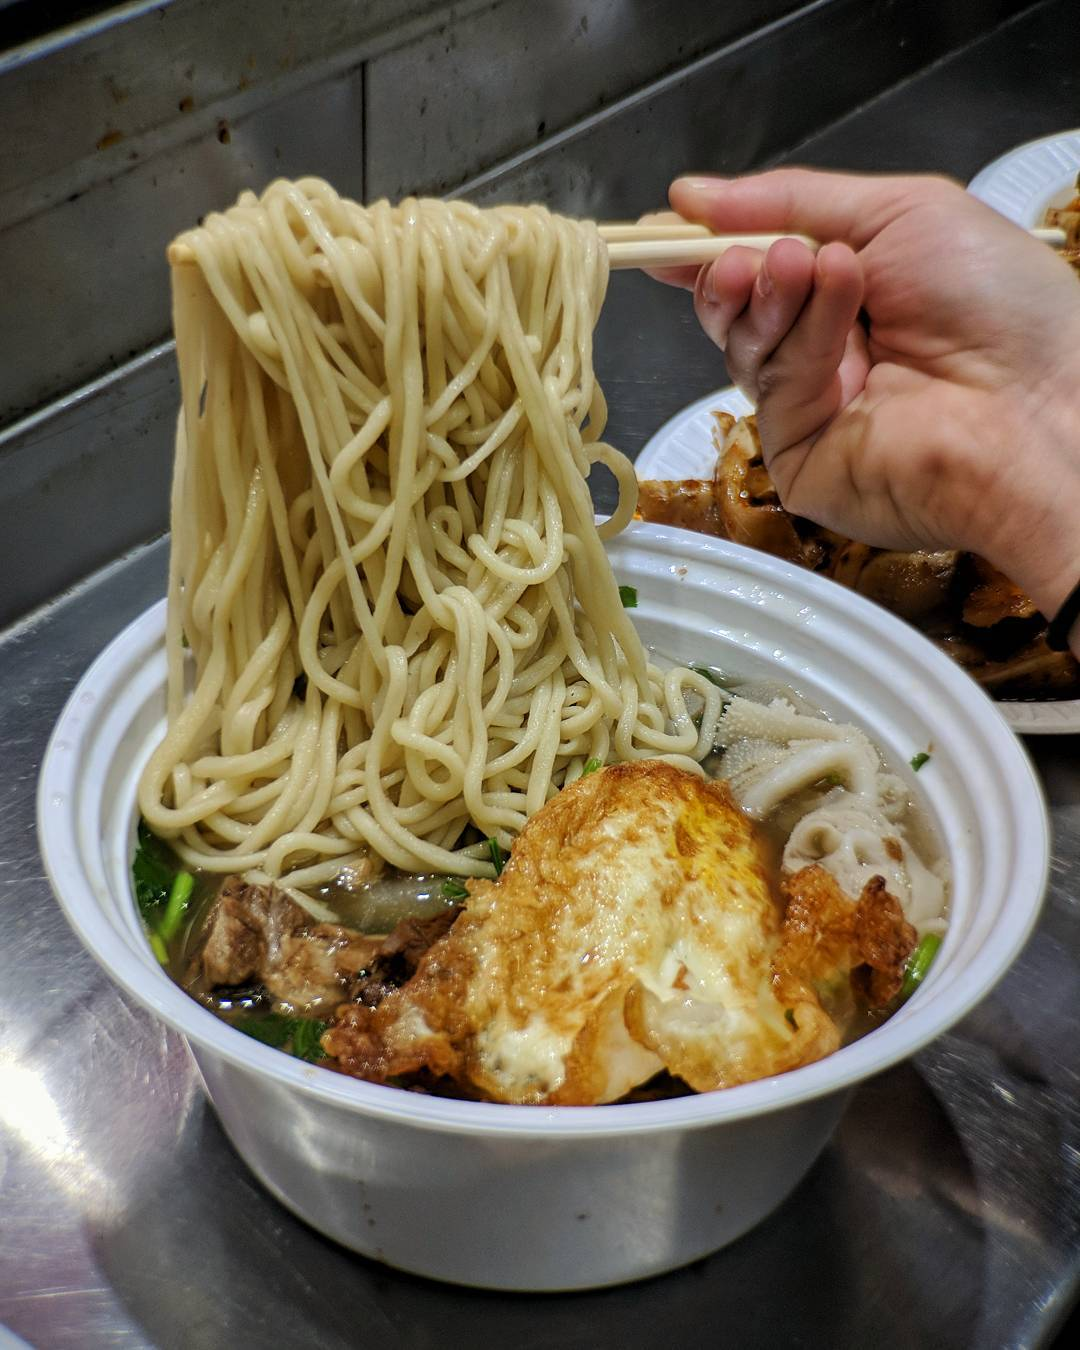 esze.e\'s Food Blog With Reviews and Photos